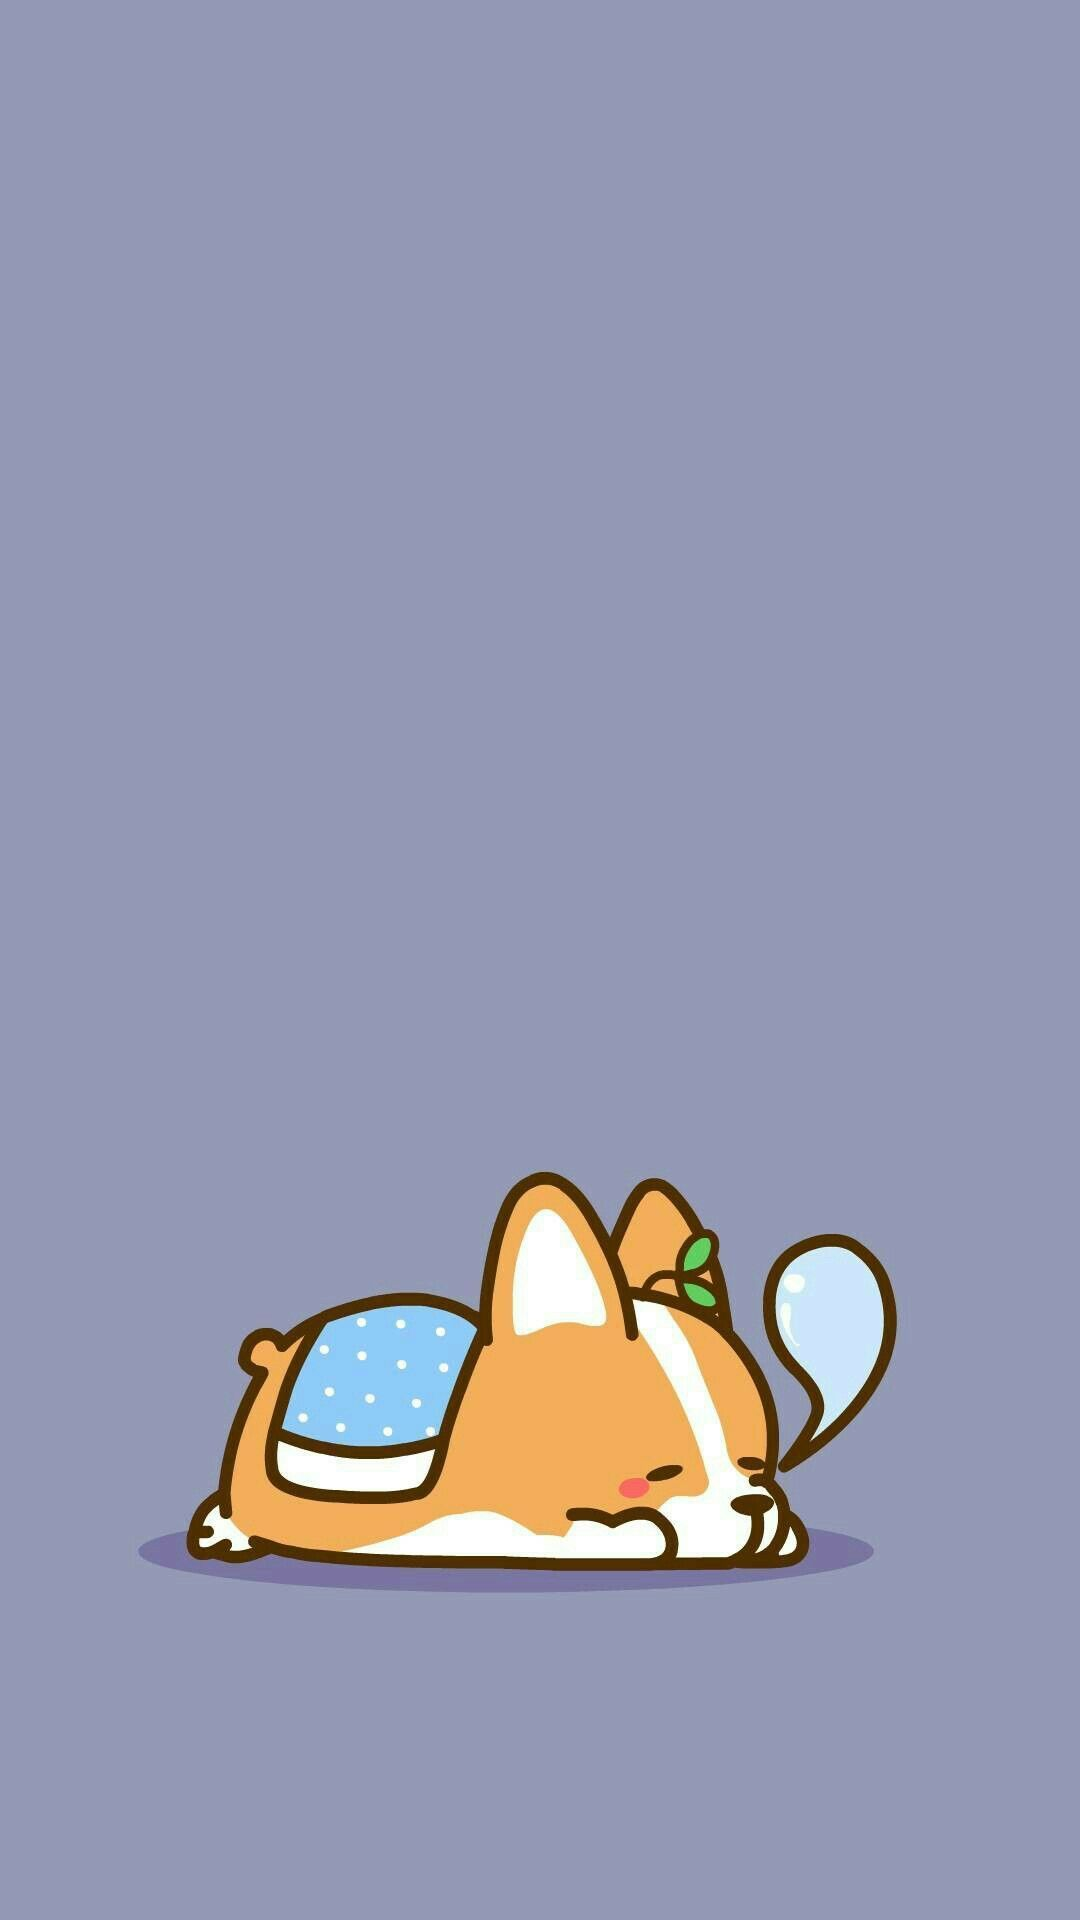 Cute Cartoon Dog Wallpapers - Top Free Cute Cartoon Dog ...